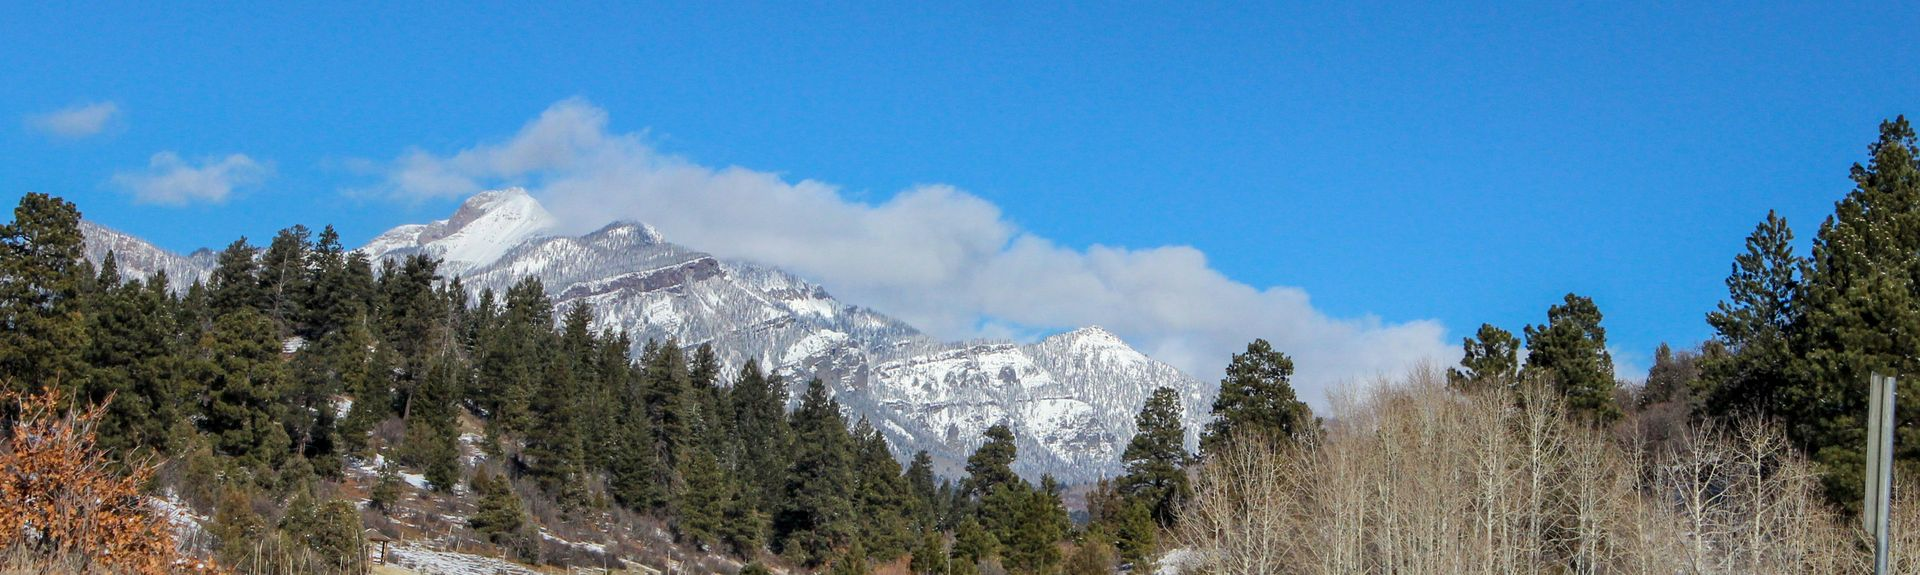 Pagosa Highlands, Pagosa Springs, CO, USA